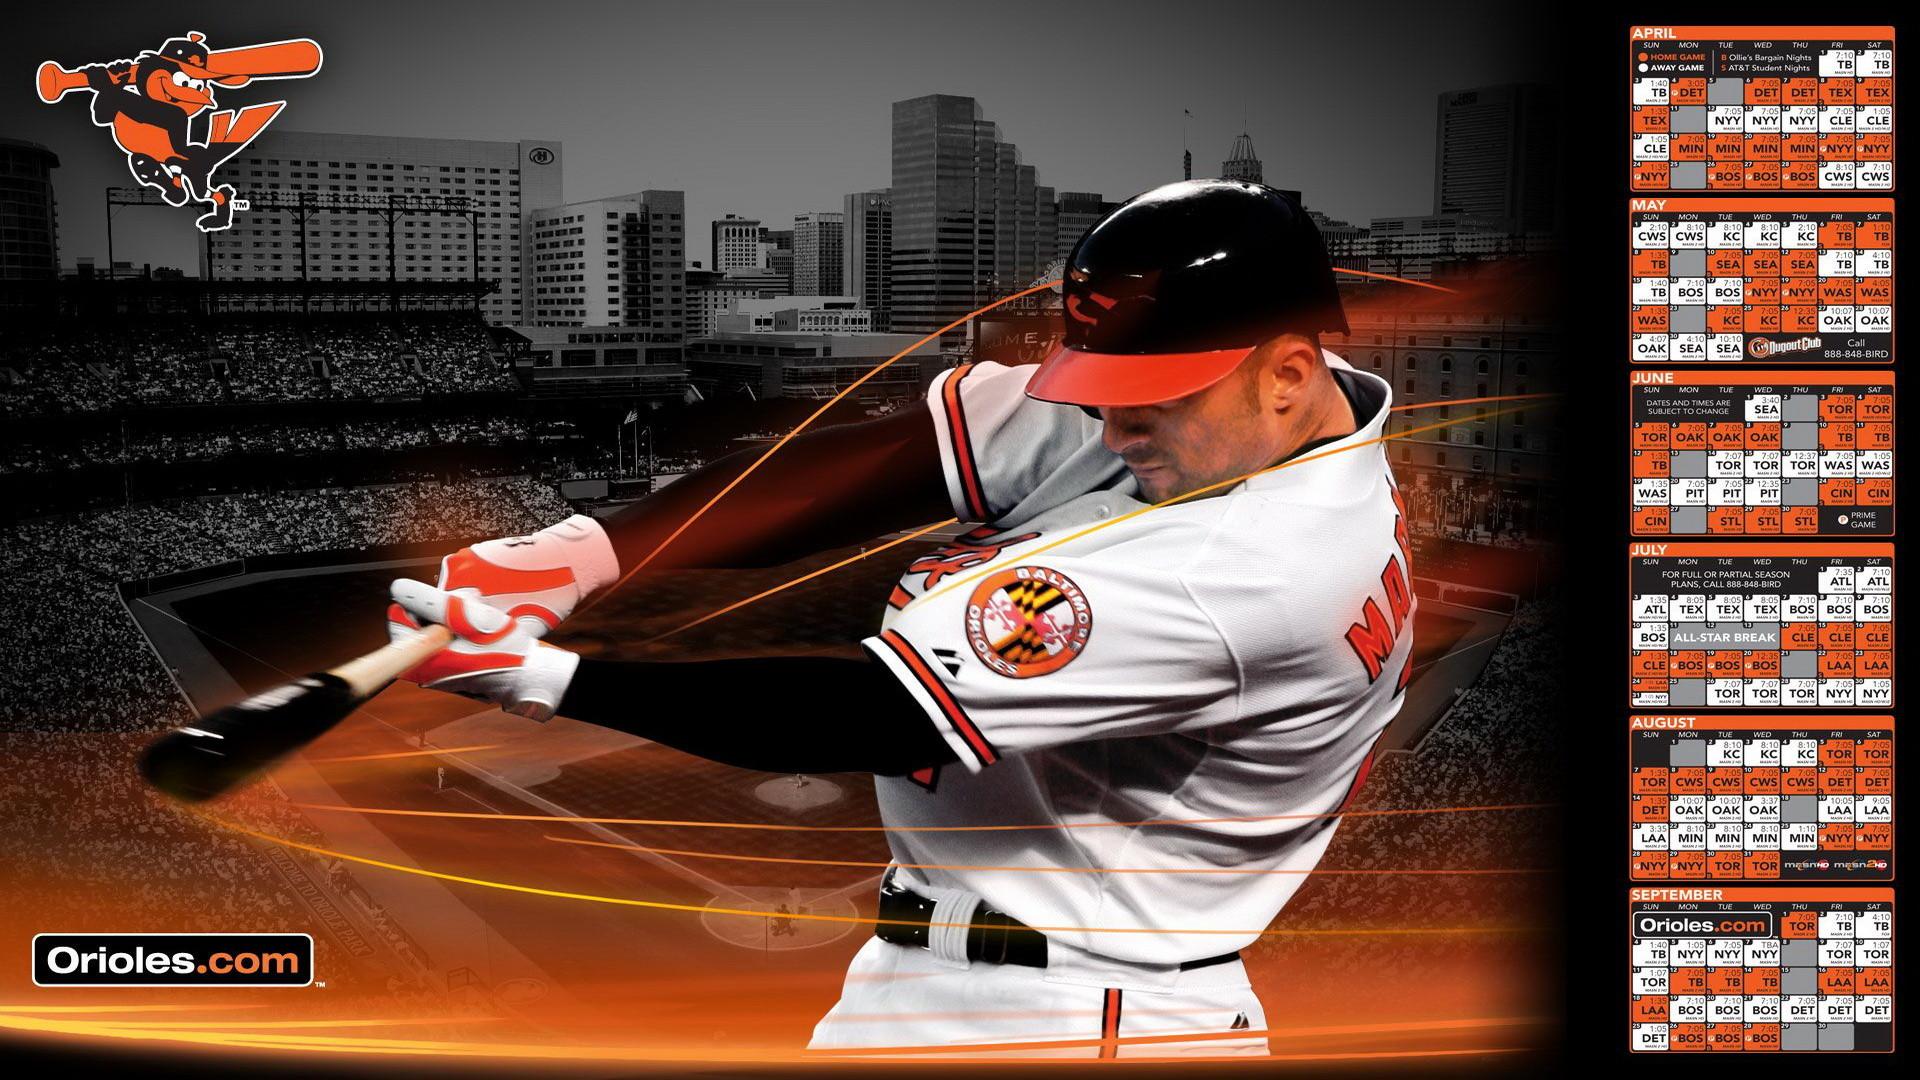 HD Baltimore Orioles Baseball Player 1080p Wallpaper Full Size .